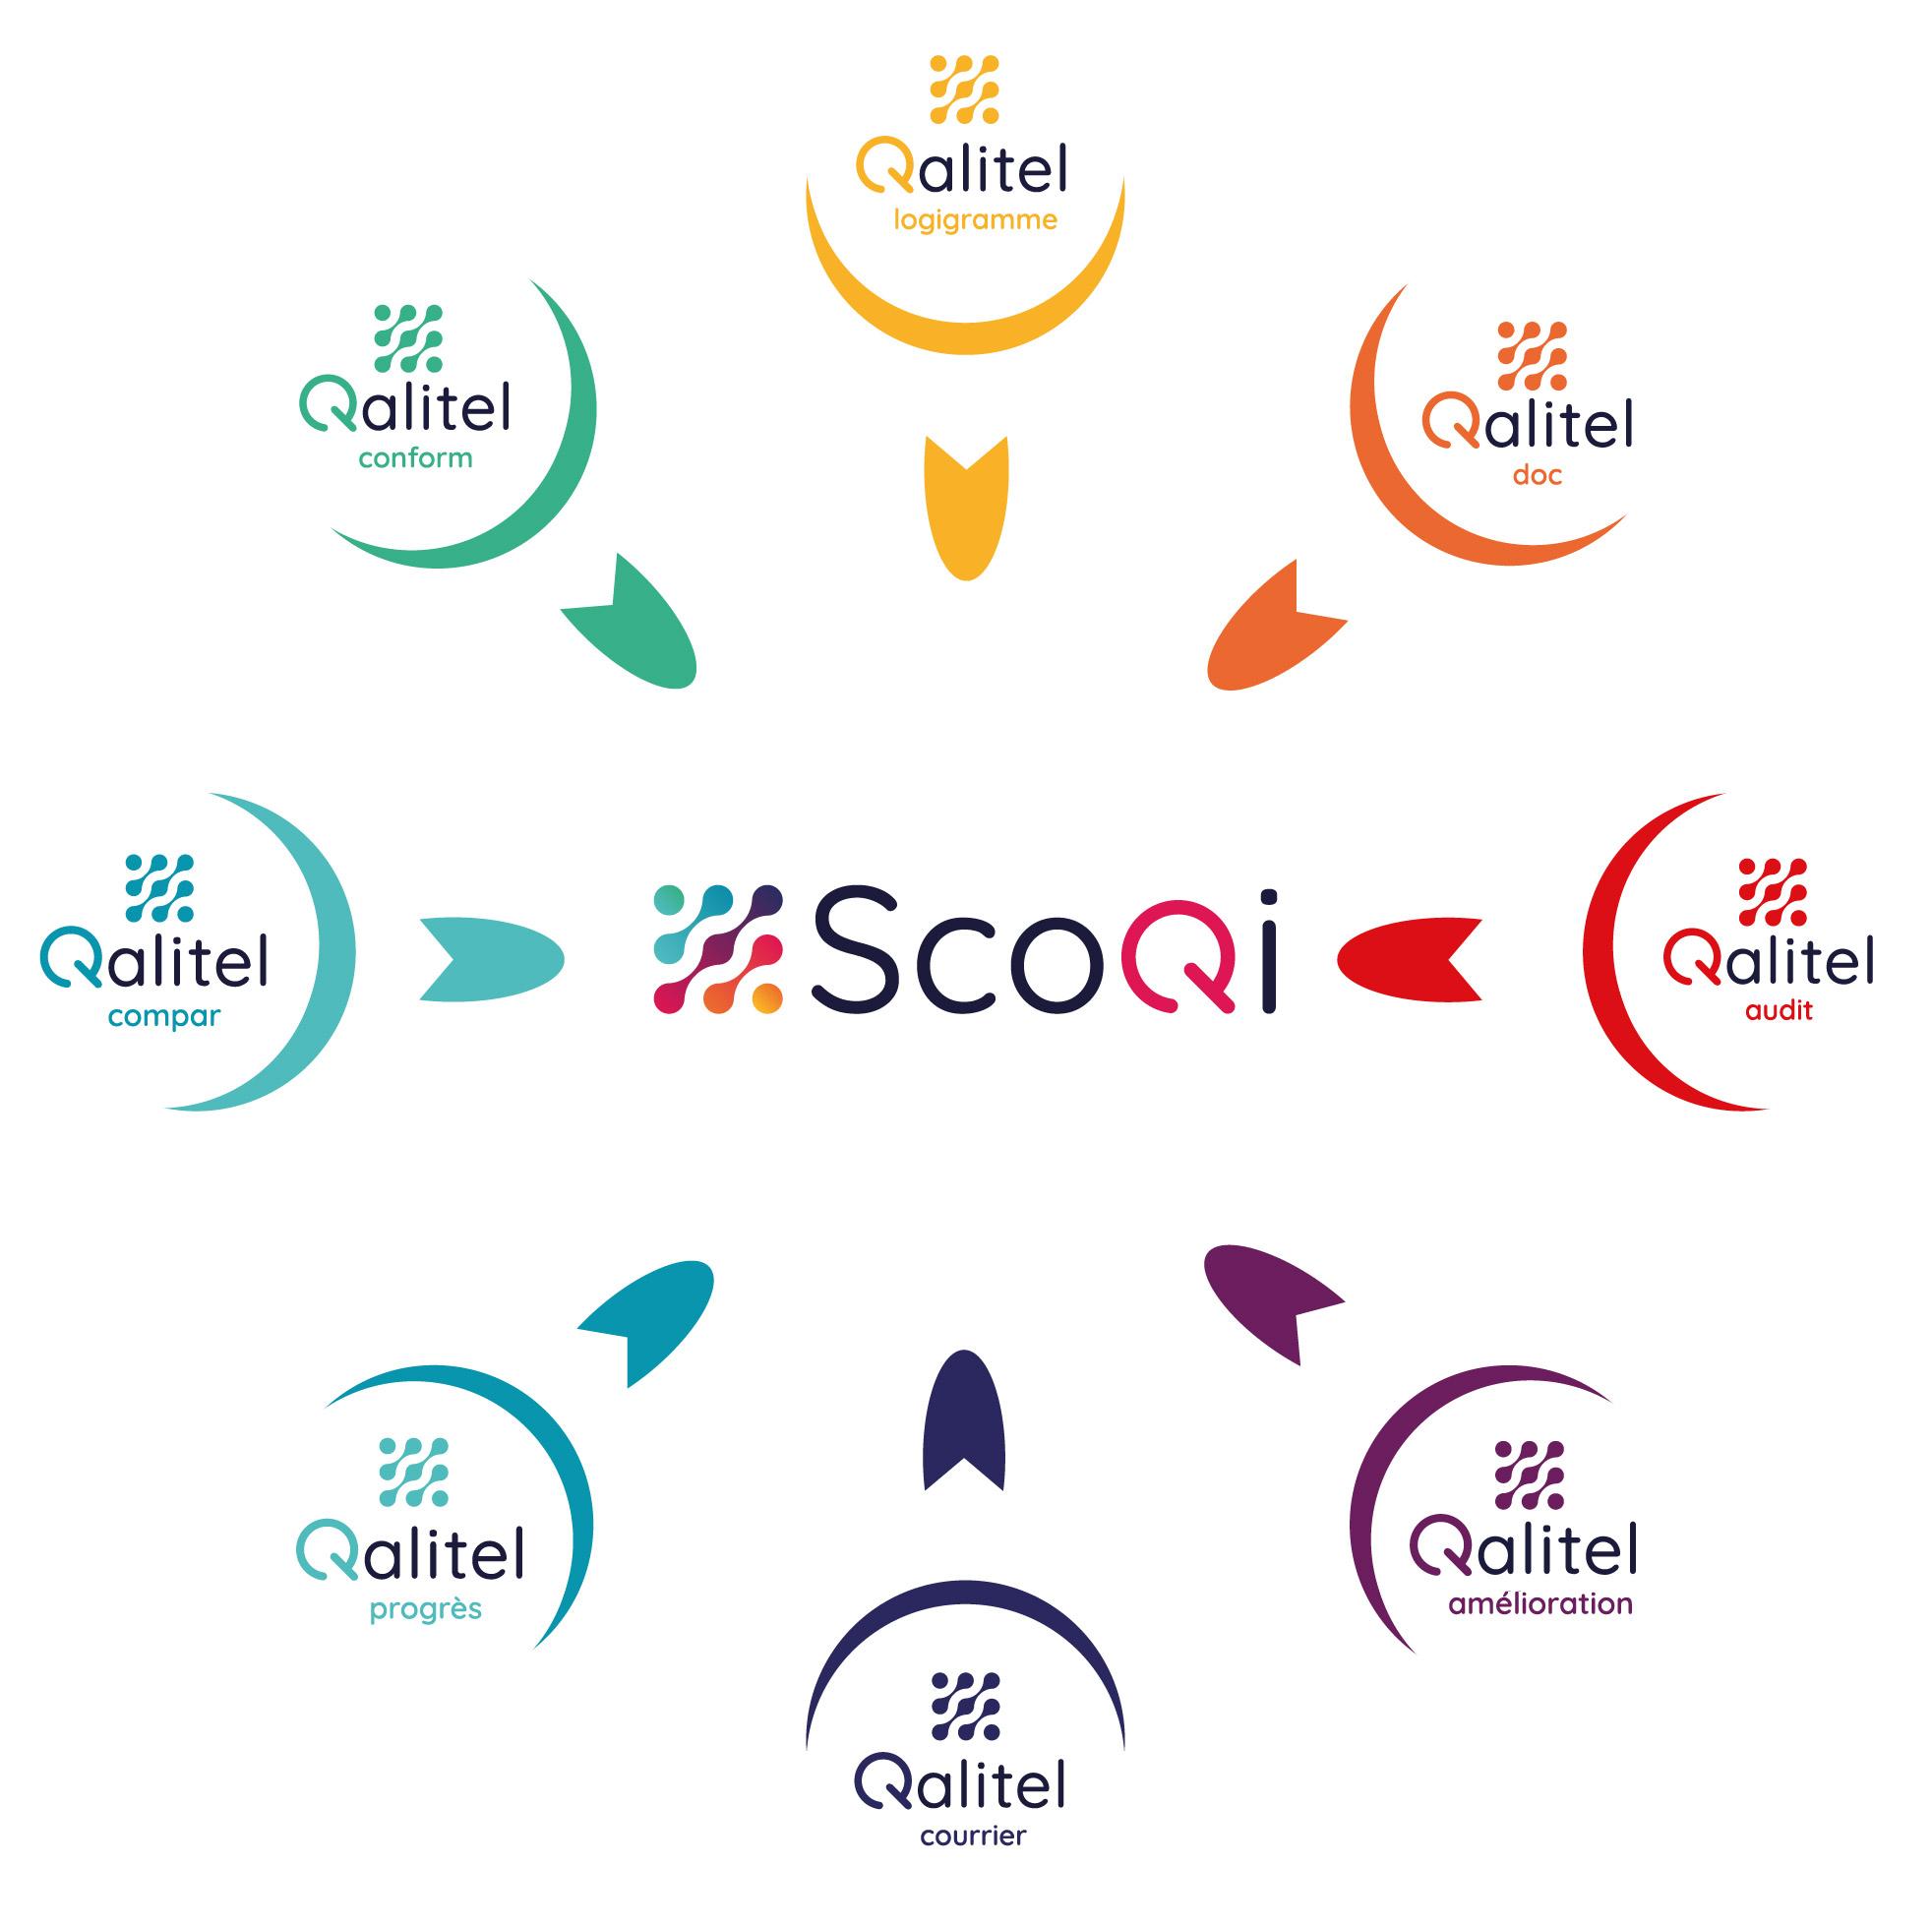 Gamme qalitel, logiciel qualite selon la norme iso 9001